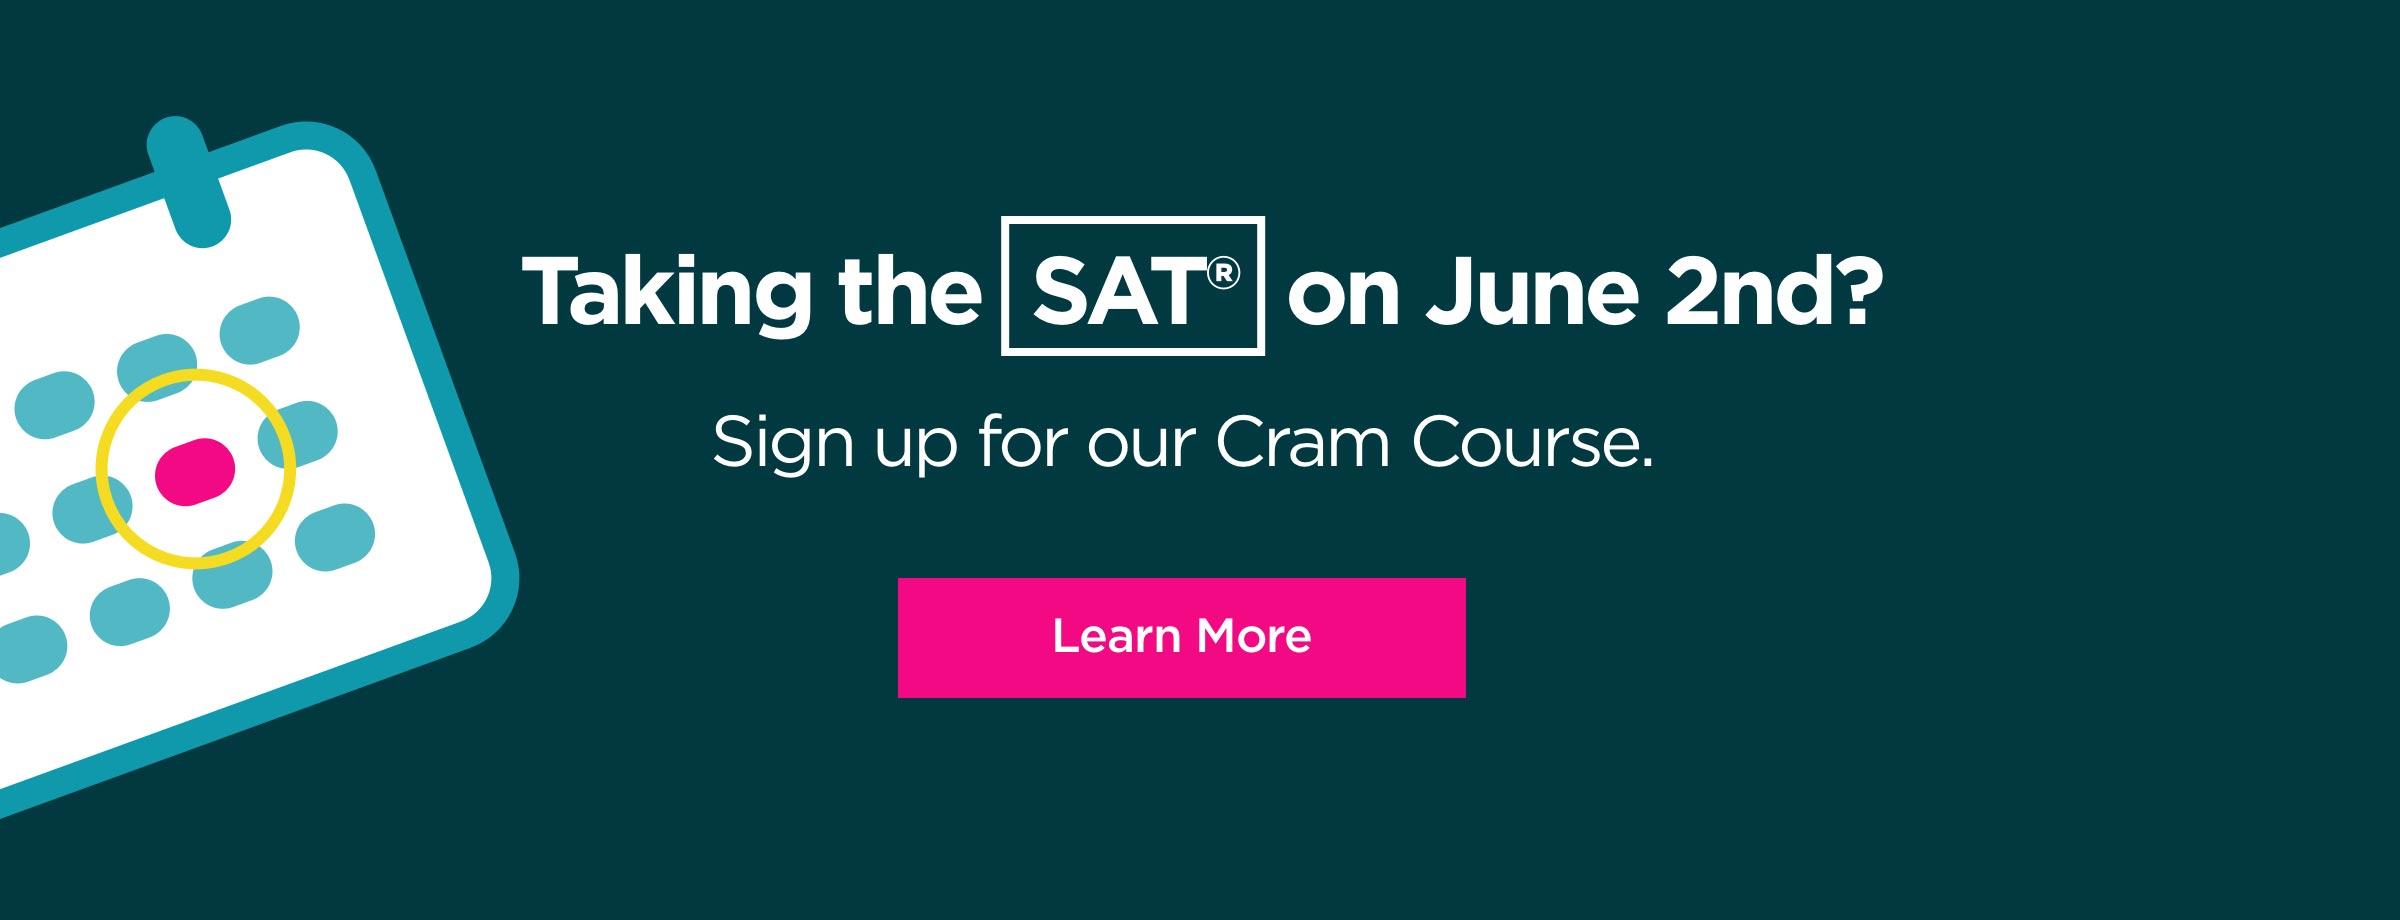 June SAT Cram